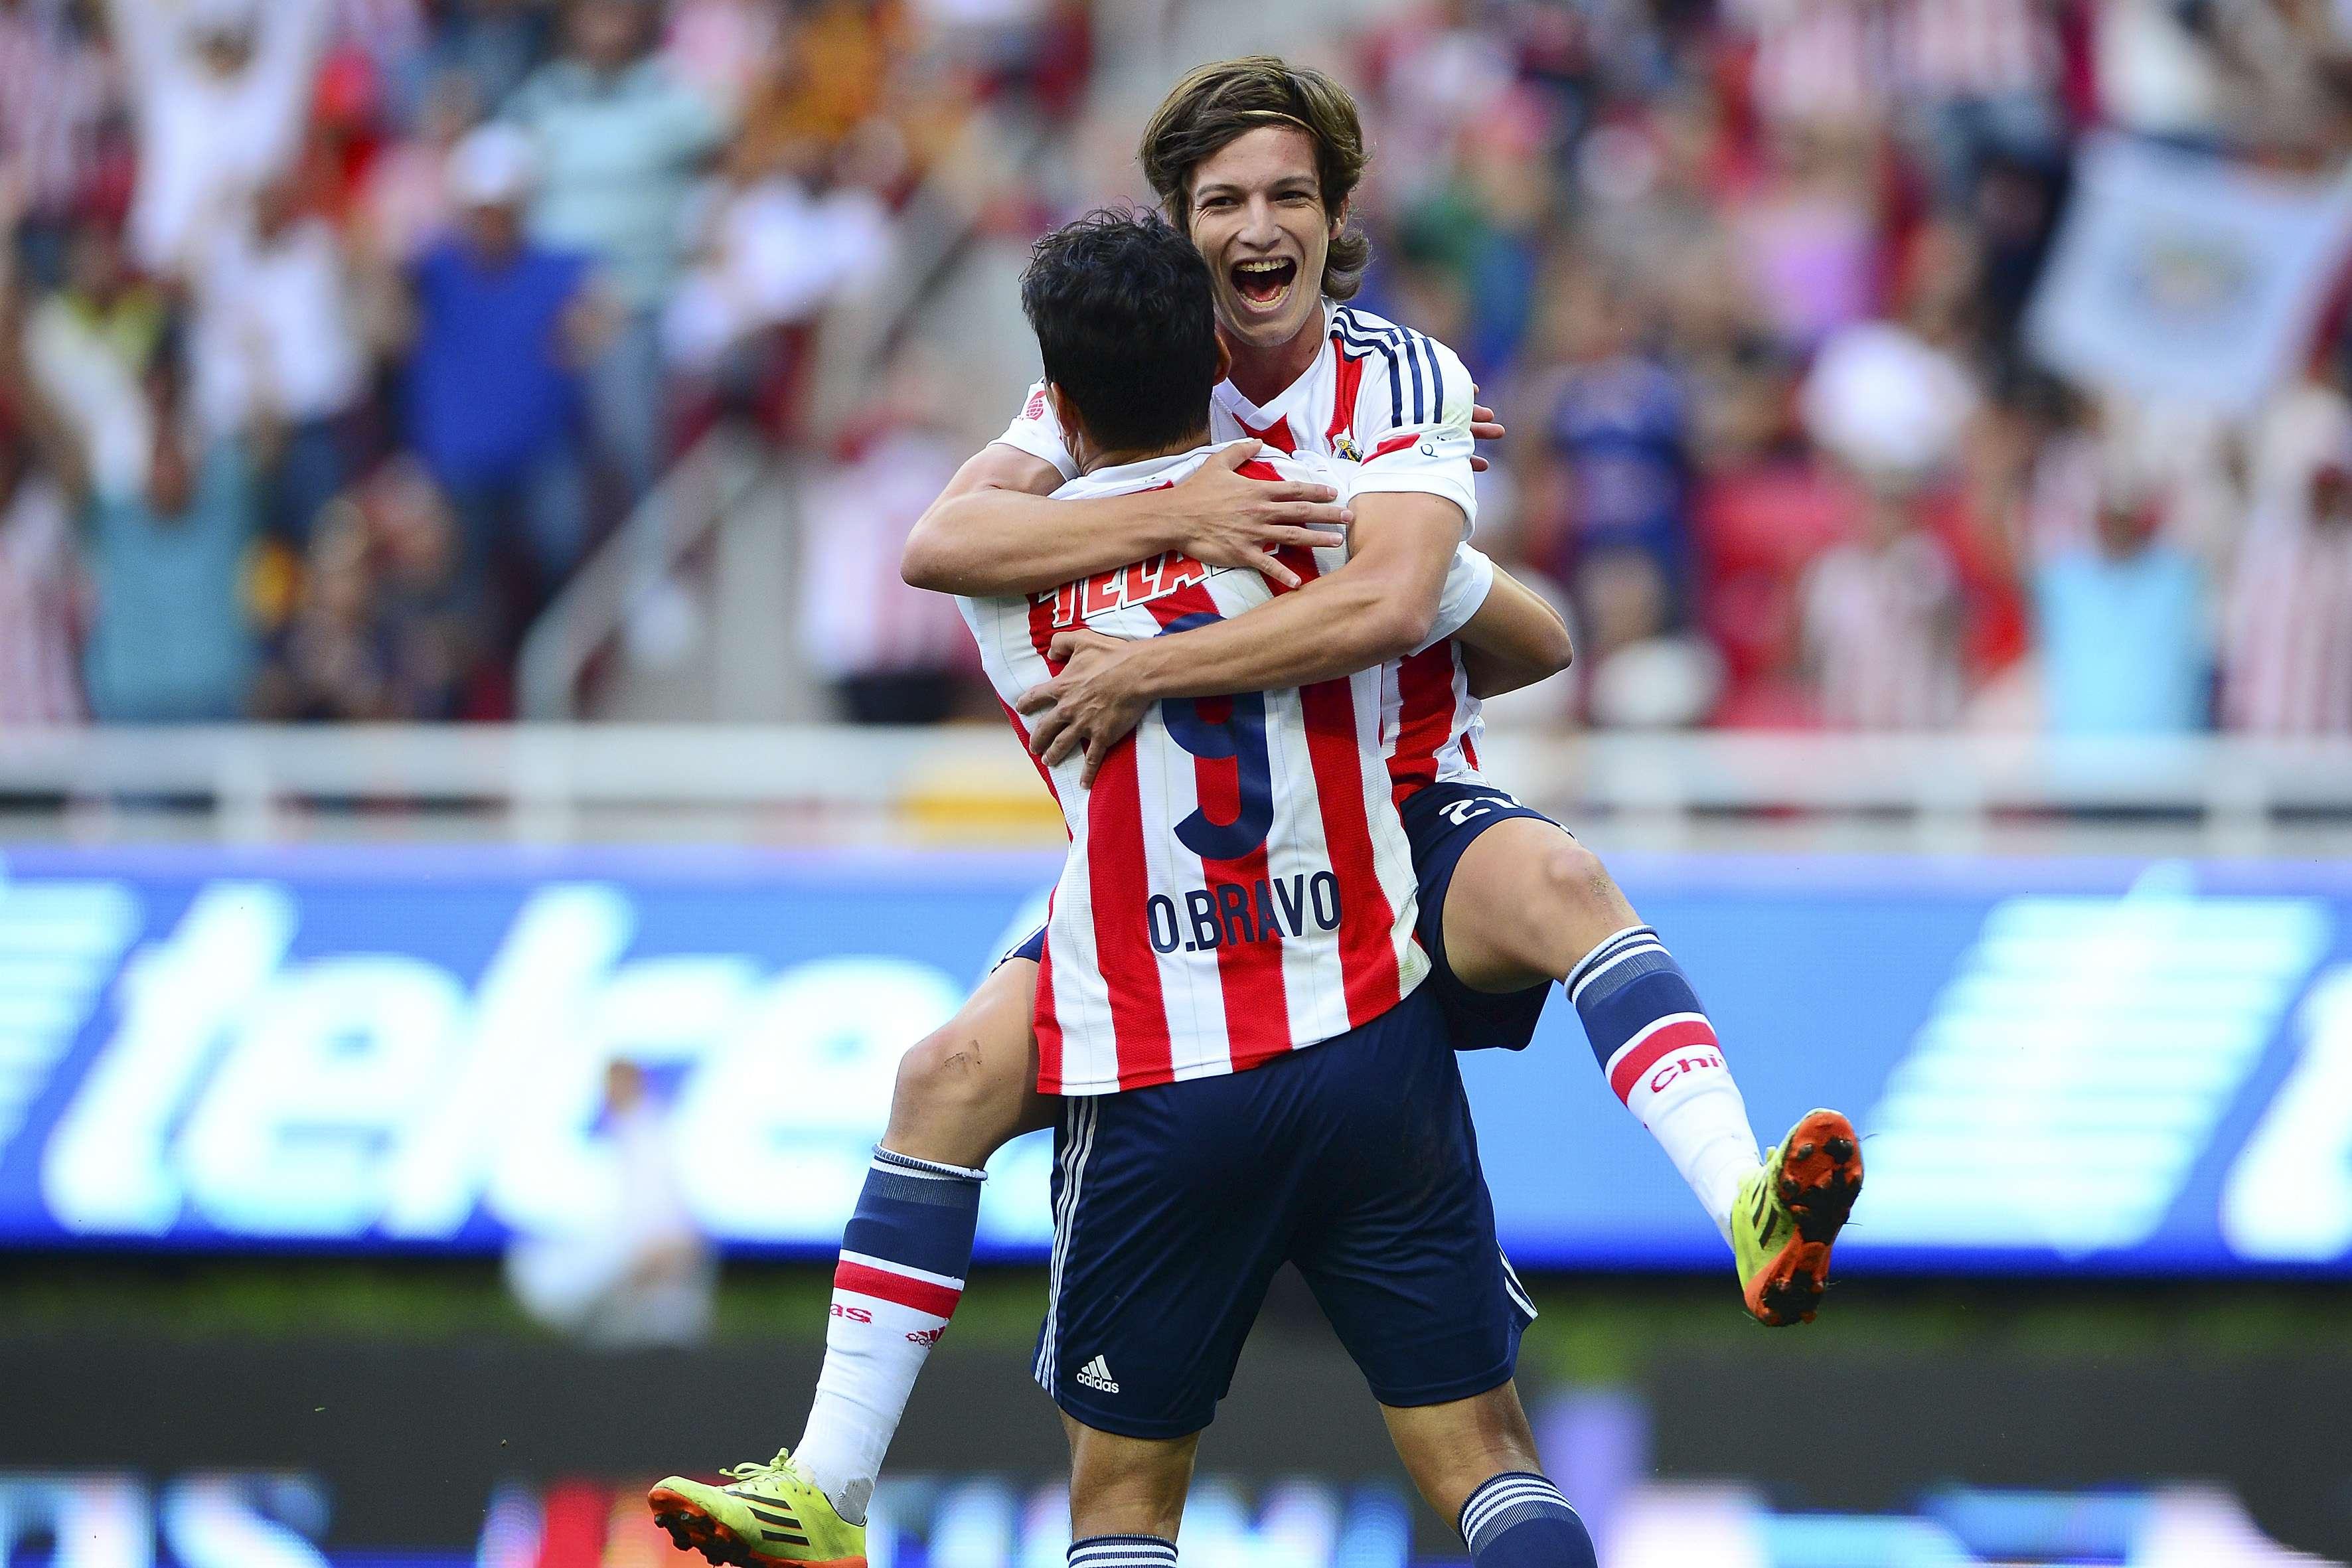 Carlos Fierro marcó sus primeros goles del torneo. Foto: Mexsport